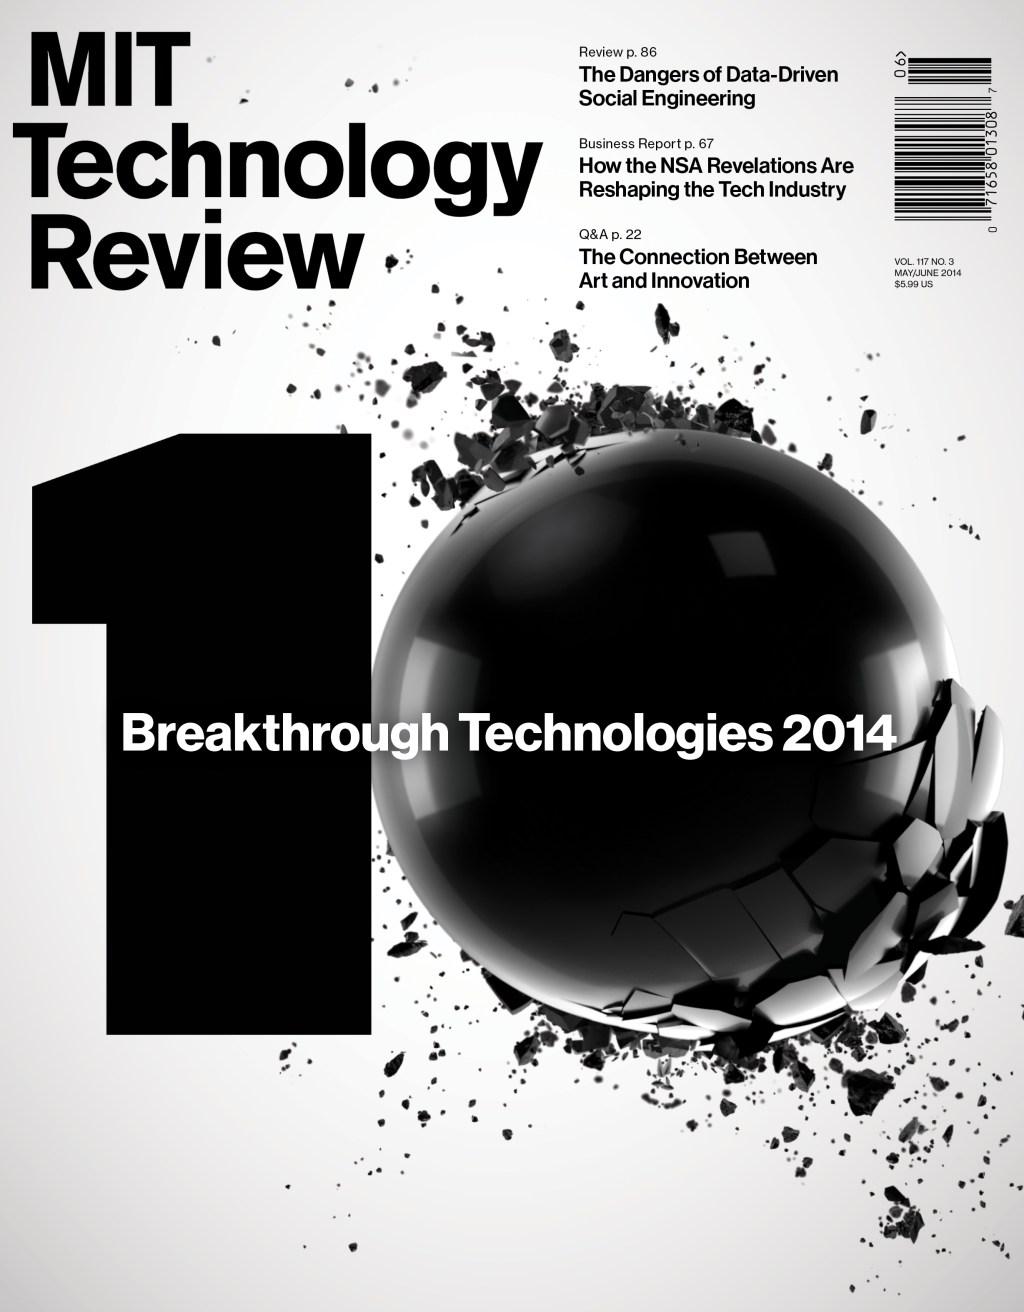 10 Breakthrough Technologies 2014